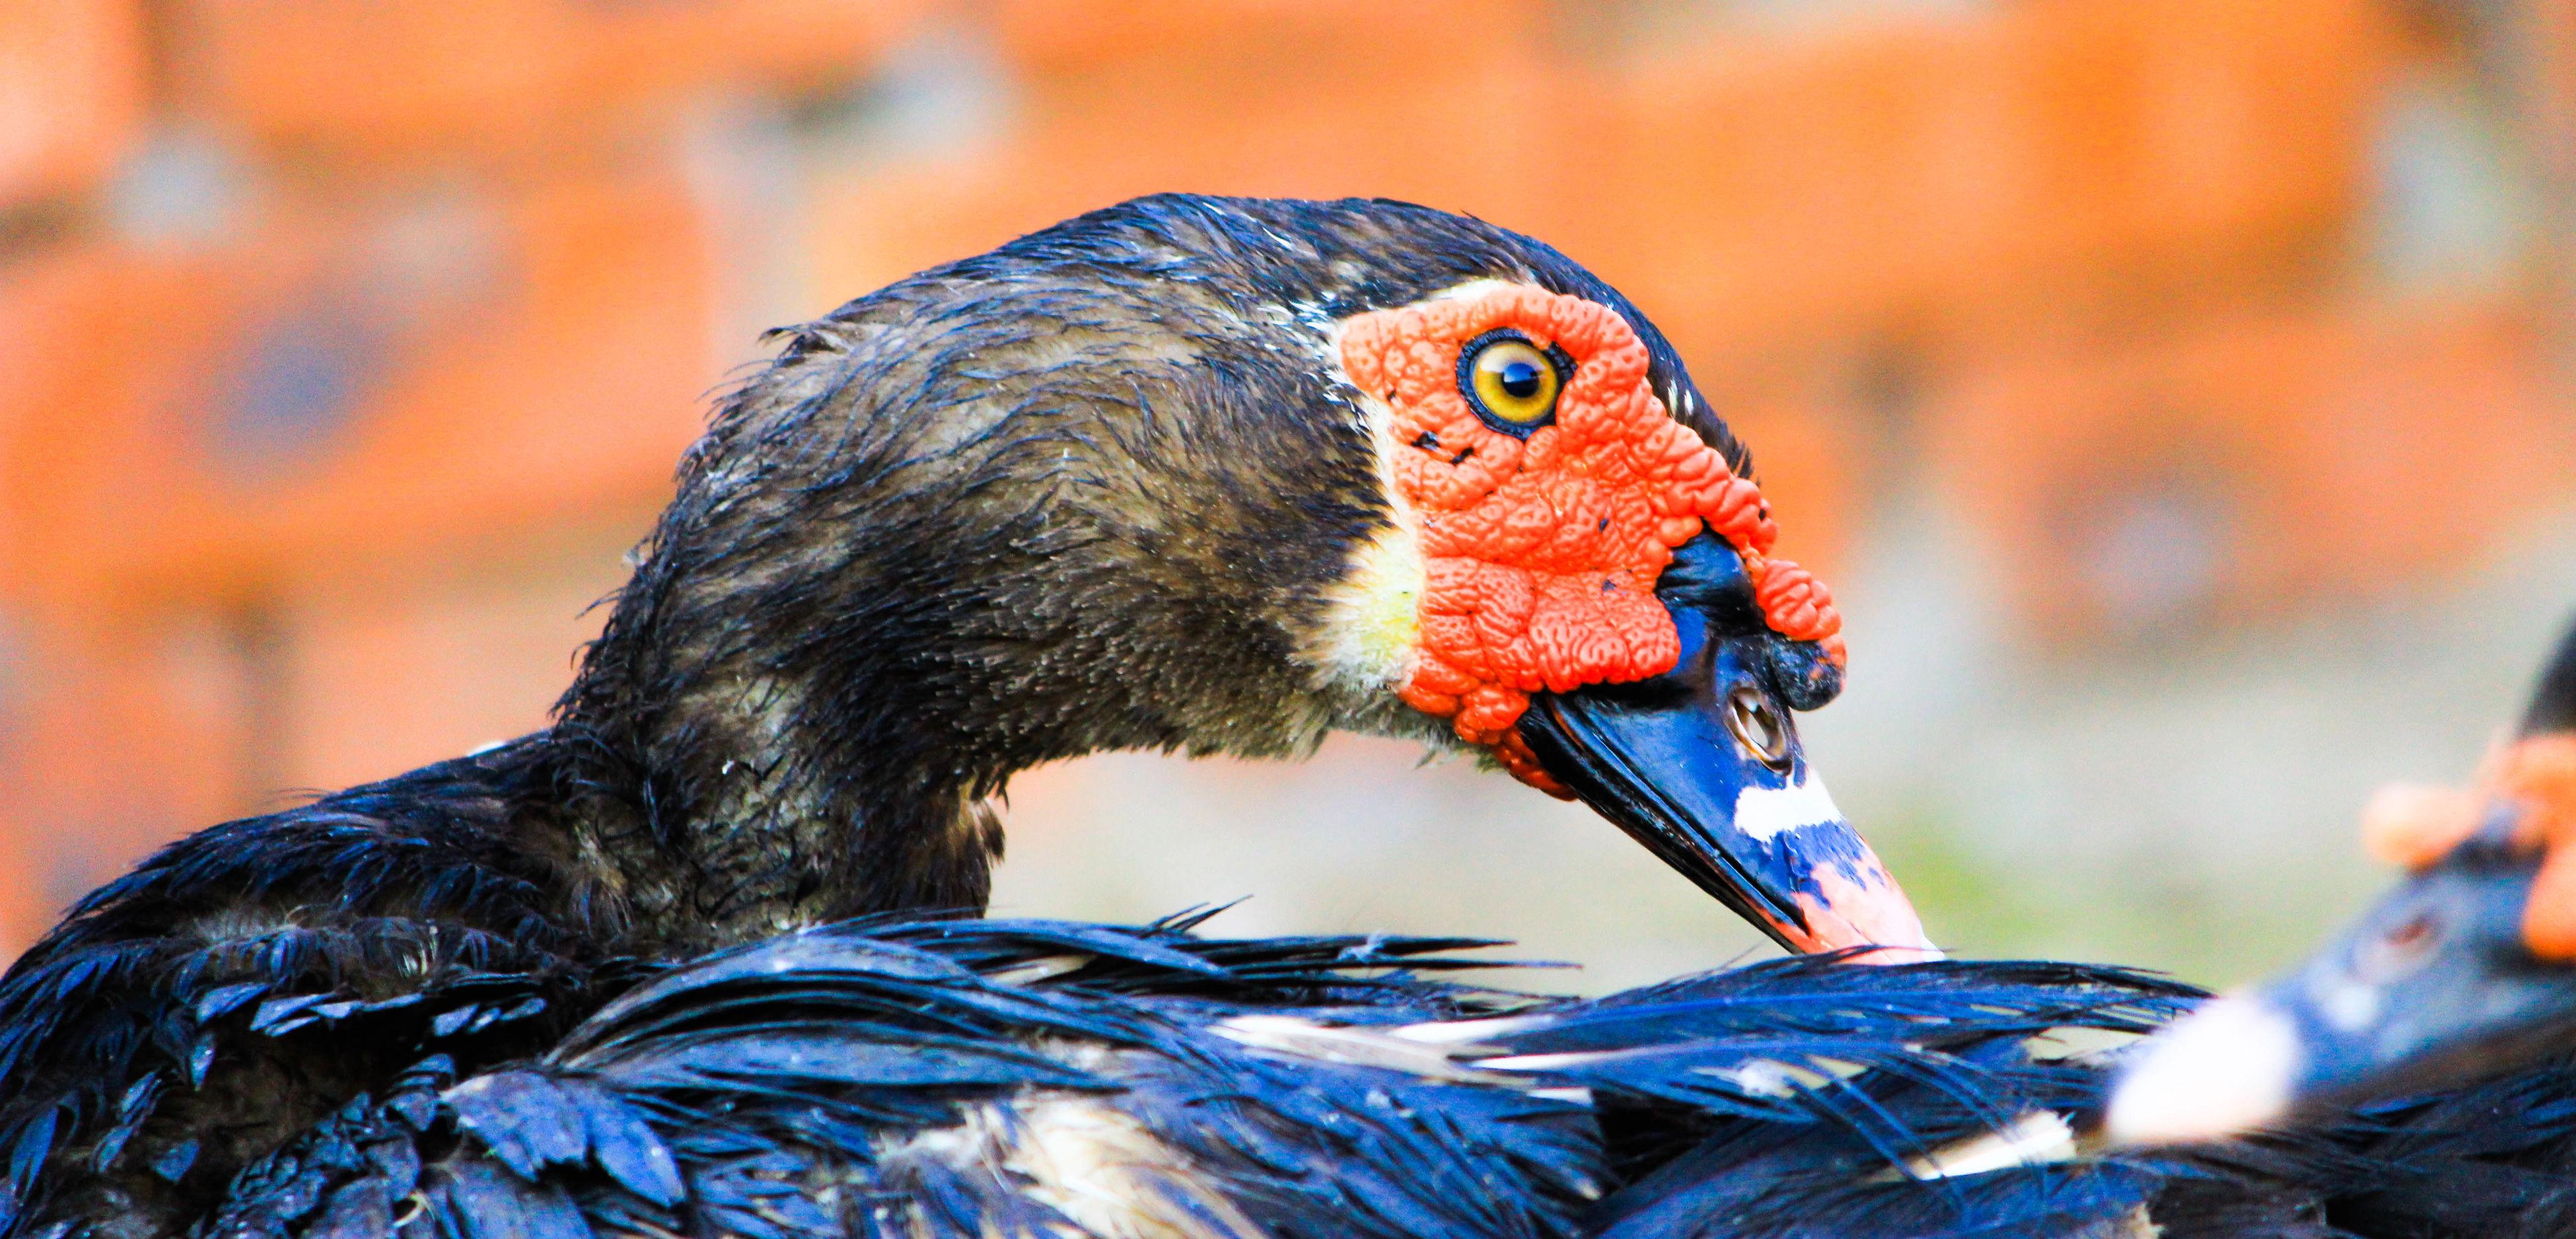 bird, animal themes, beak, one animal, animals in the wild, close-up, focus on foreground, animal wildlife, outdoors, day, no people